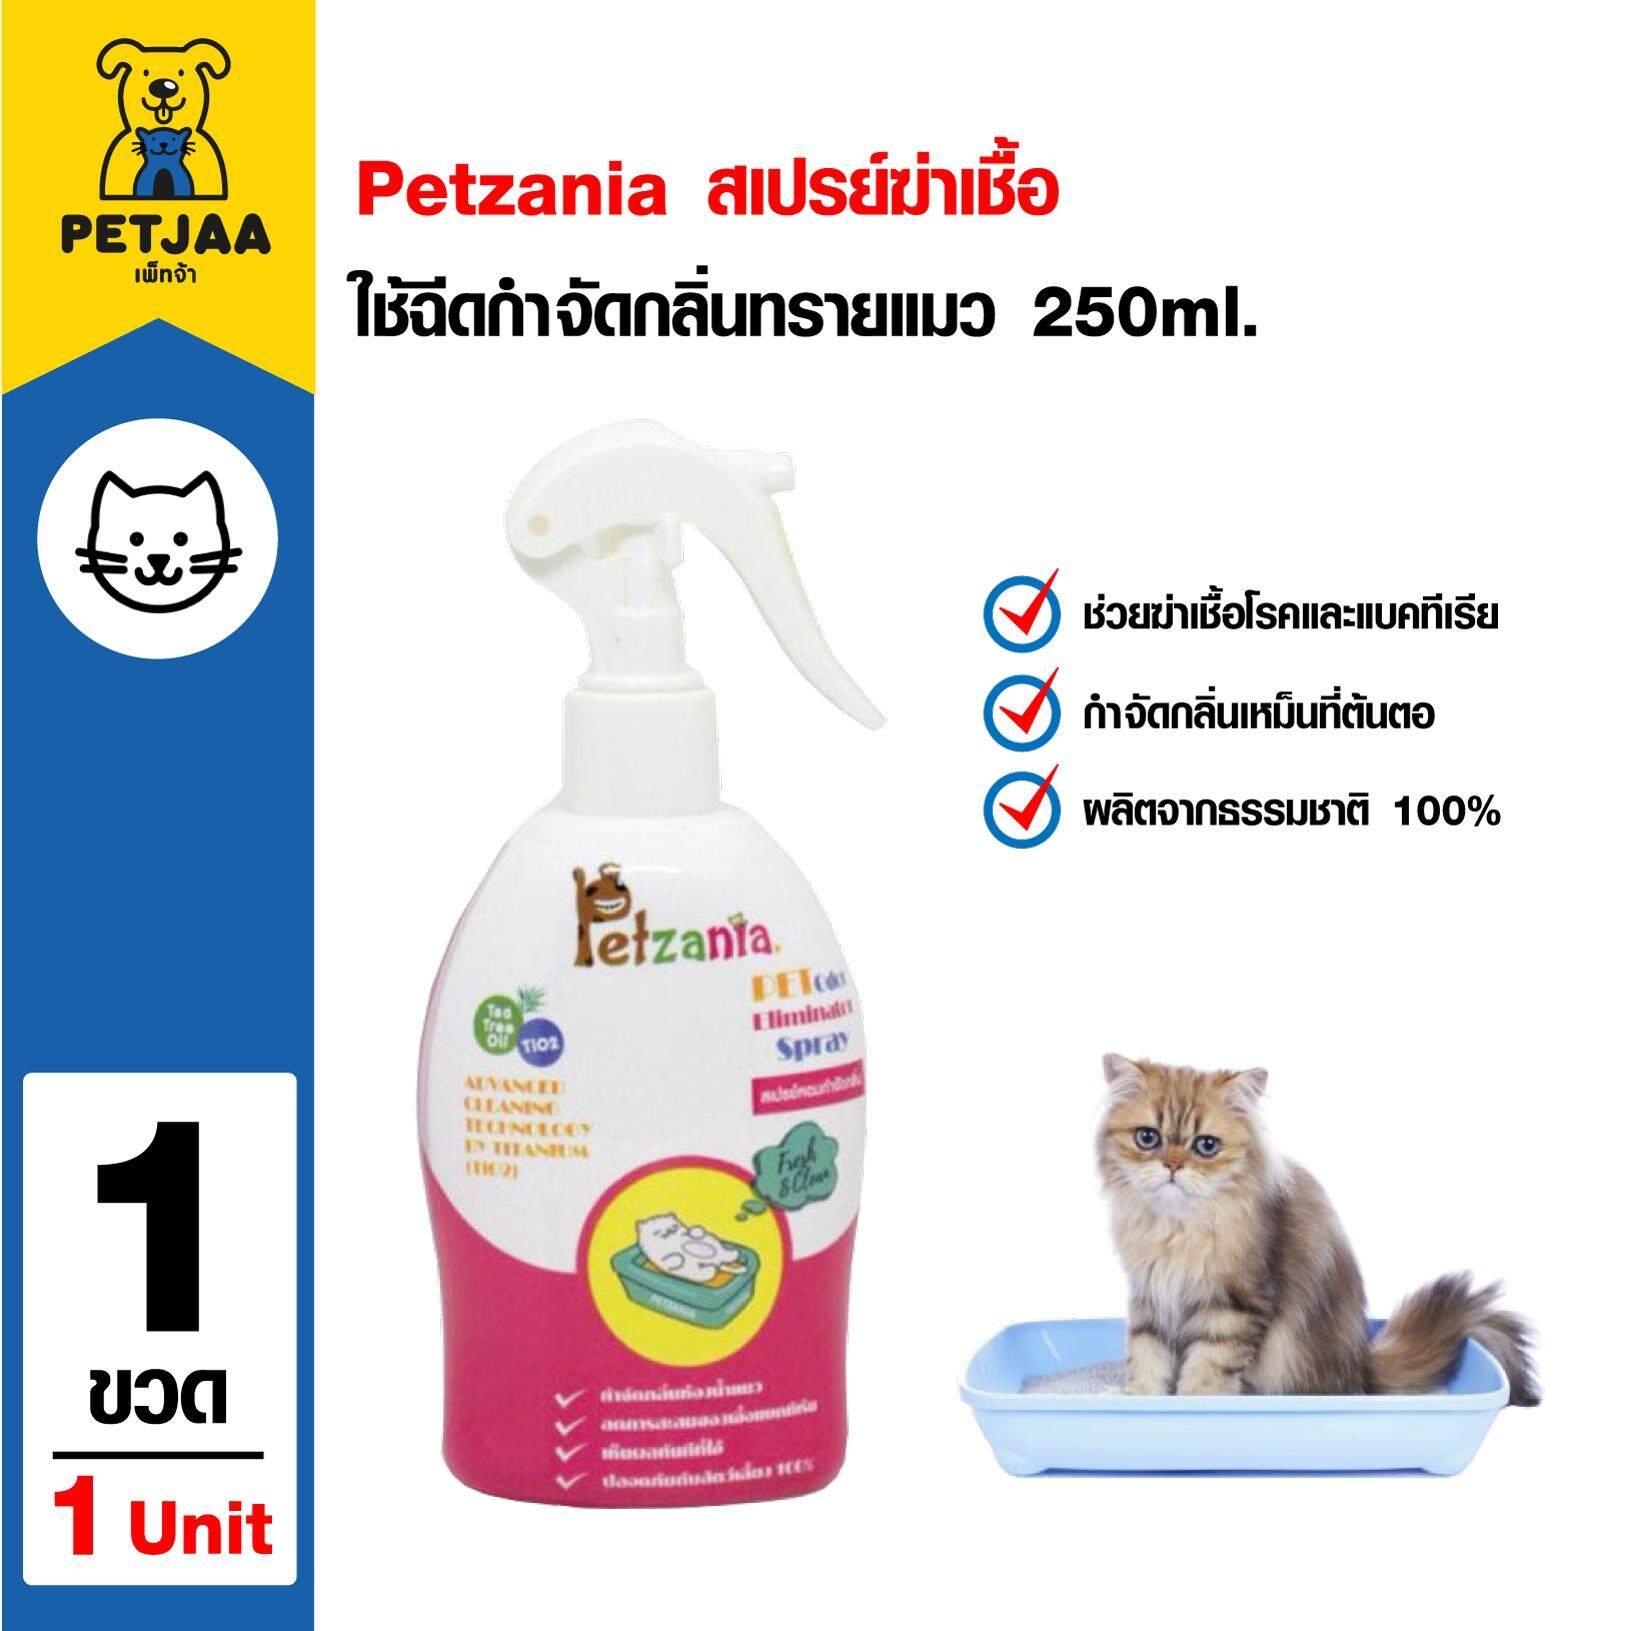 Petjaa Petzania สเปรย์ฆ่าเชื้อและกำจัดกลิ่นทรายแมว 250ml. By Petjaa.